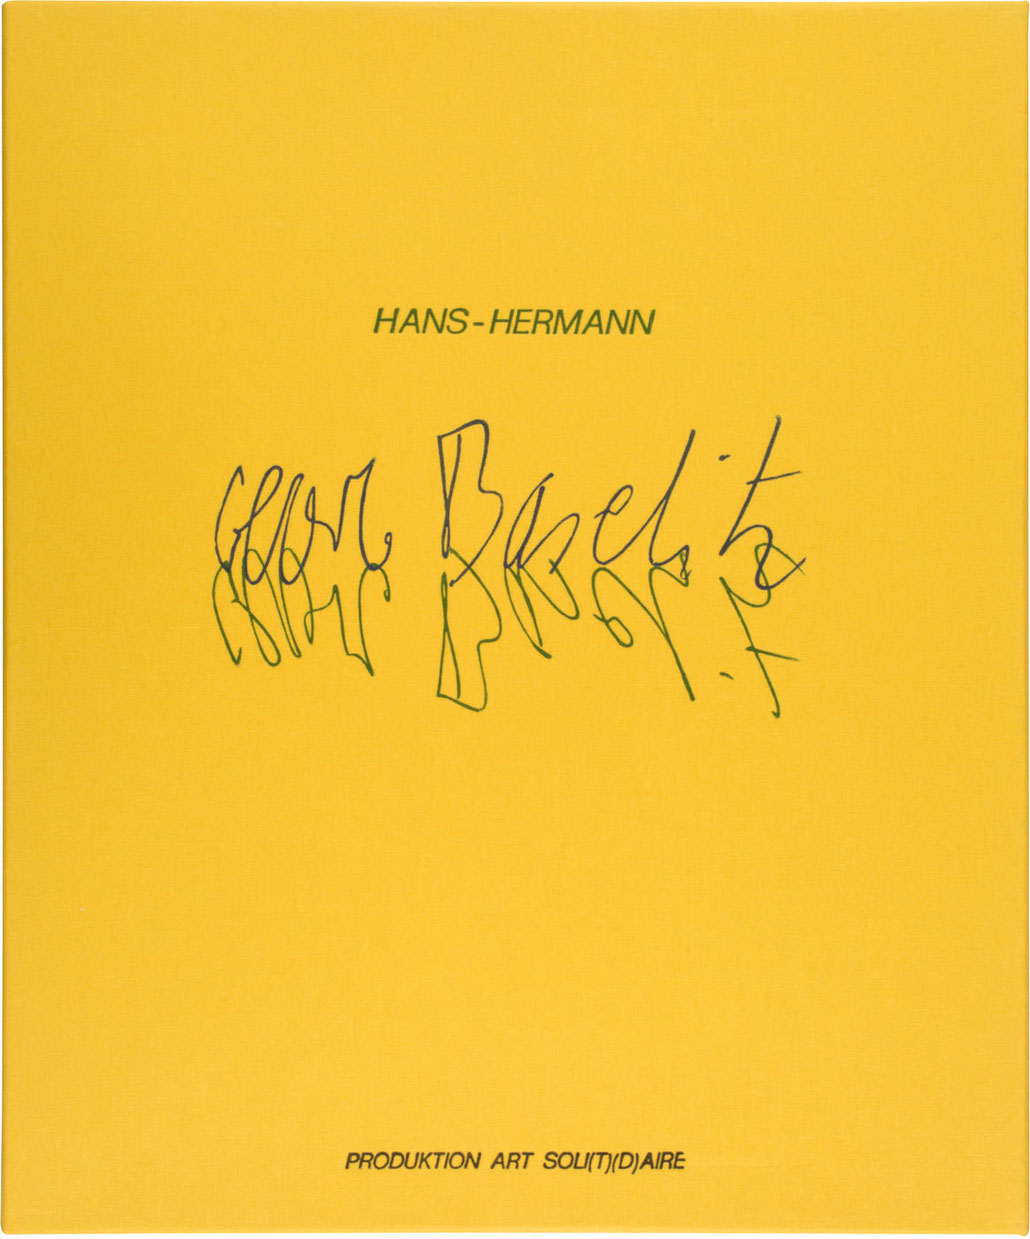 Georg Baselitz kaufen Edition Imperia Suite 2005 mit Hans Hermann Edition ART SOLI(T)(D)AIRE